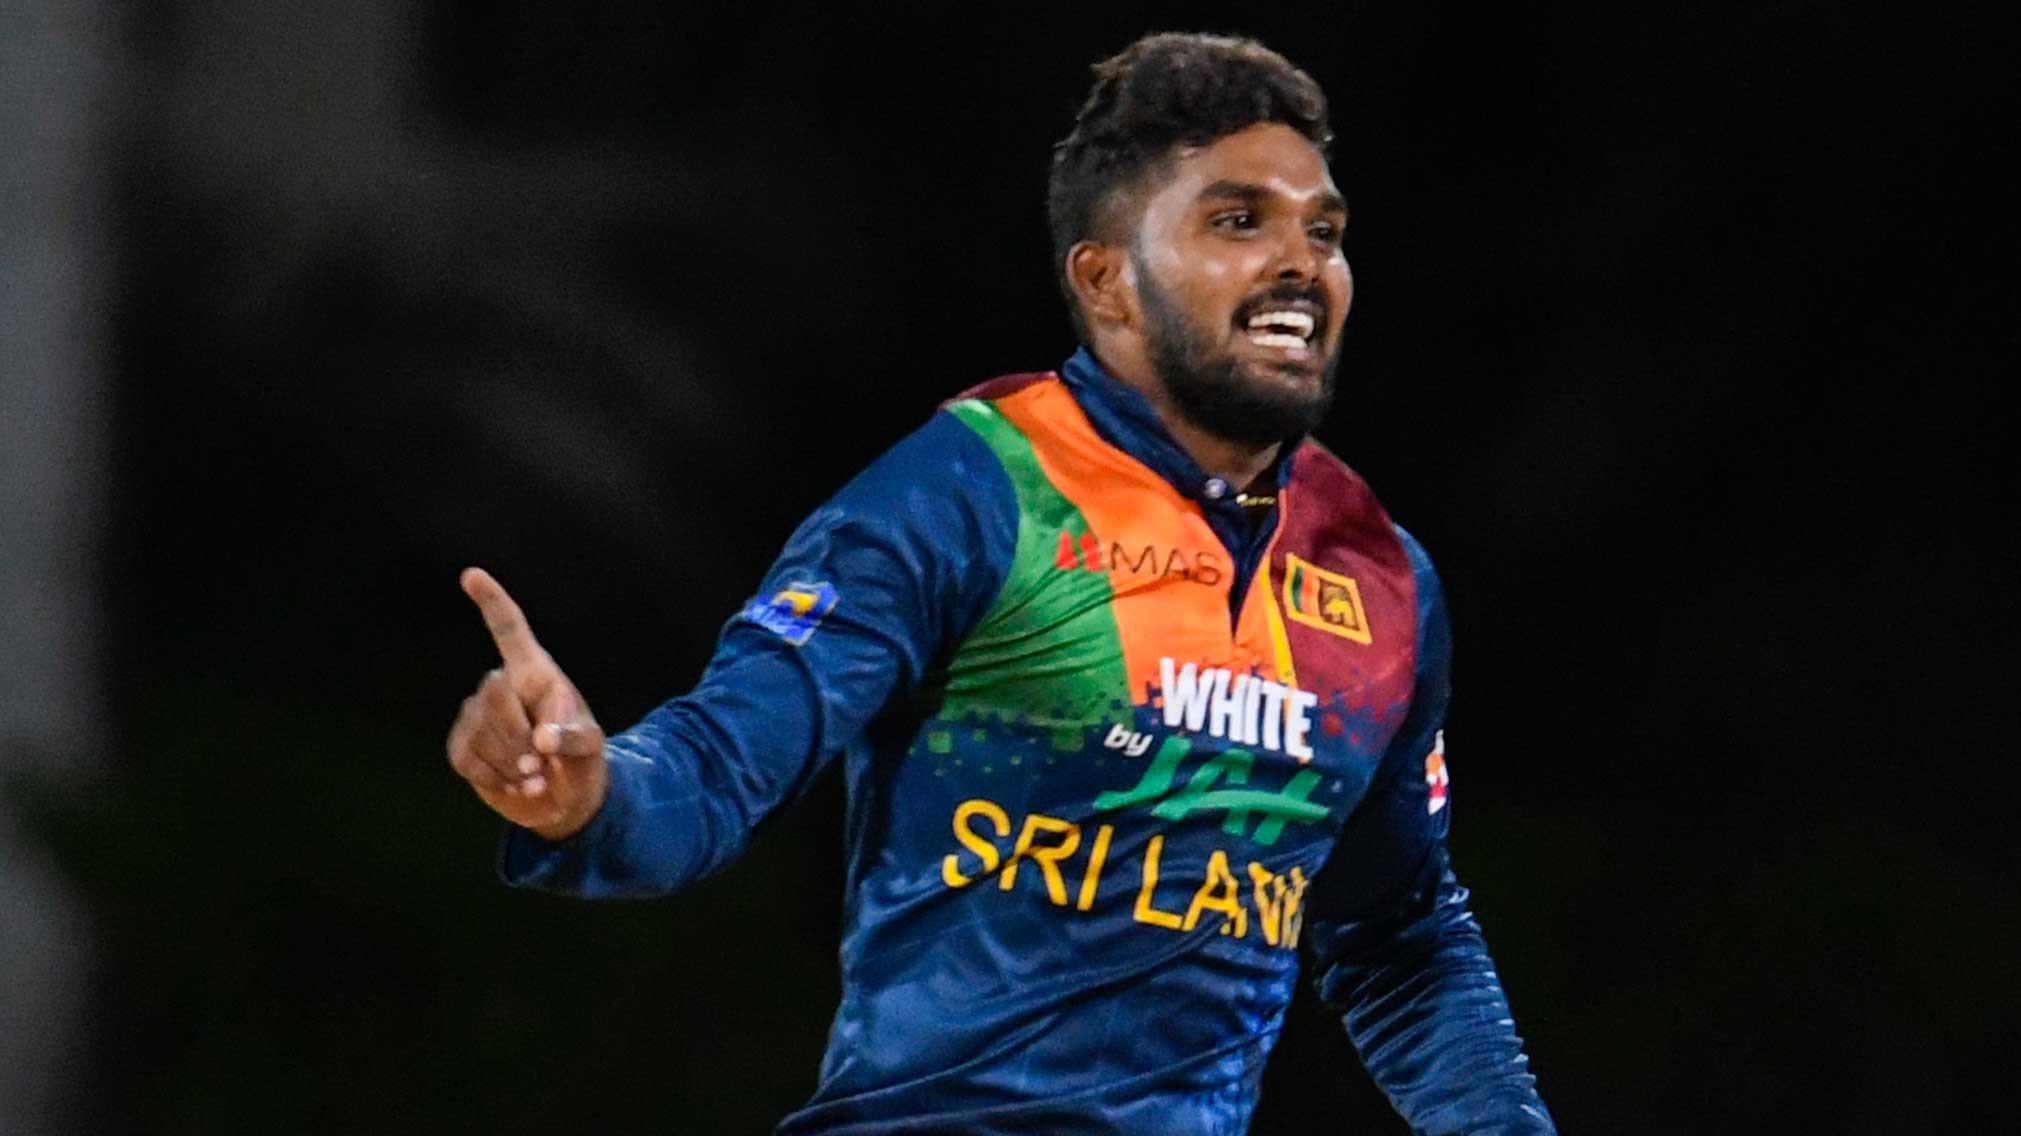 Sri Lanka's Wanindu Hasaranga attains career best 2nd spot in latest ICC T20I bowlers rankings